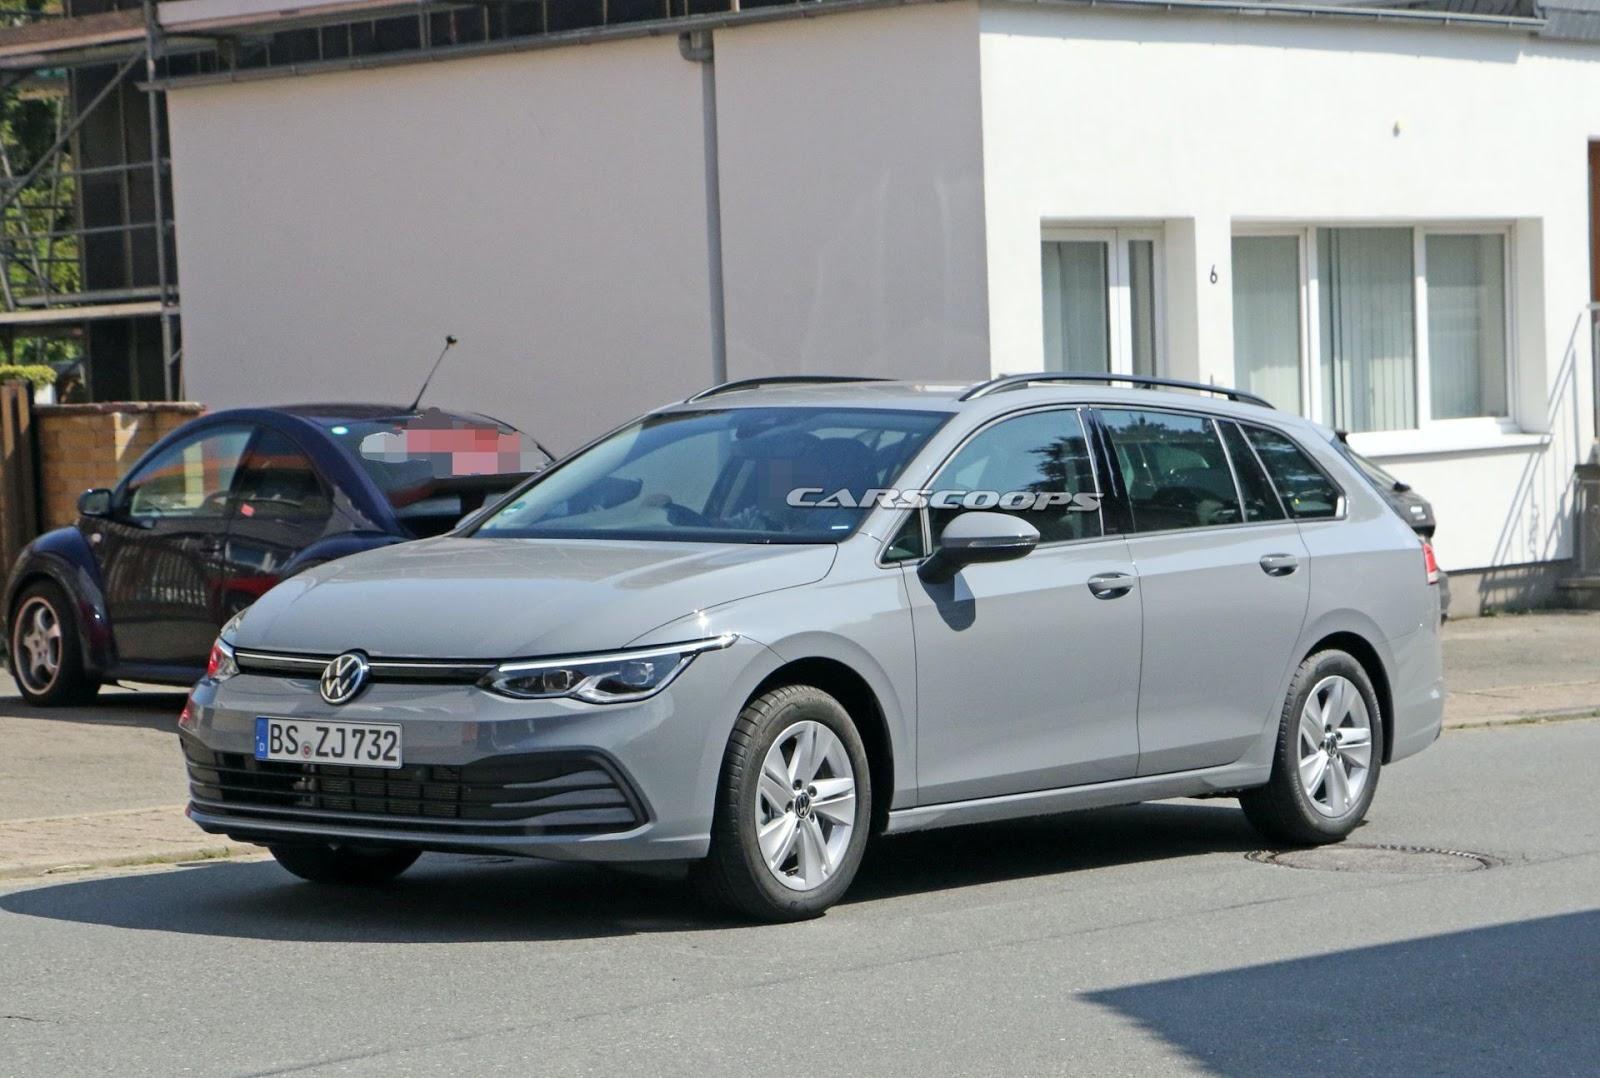 2021 VW Golf Variant spy shot - MS+ BLOG